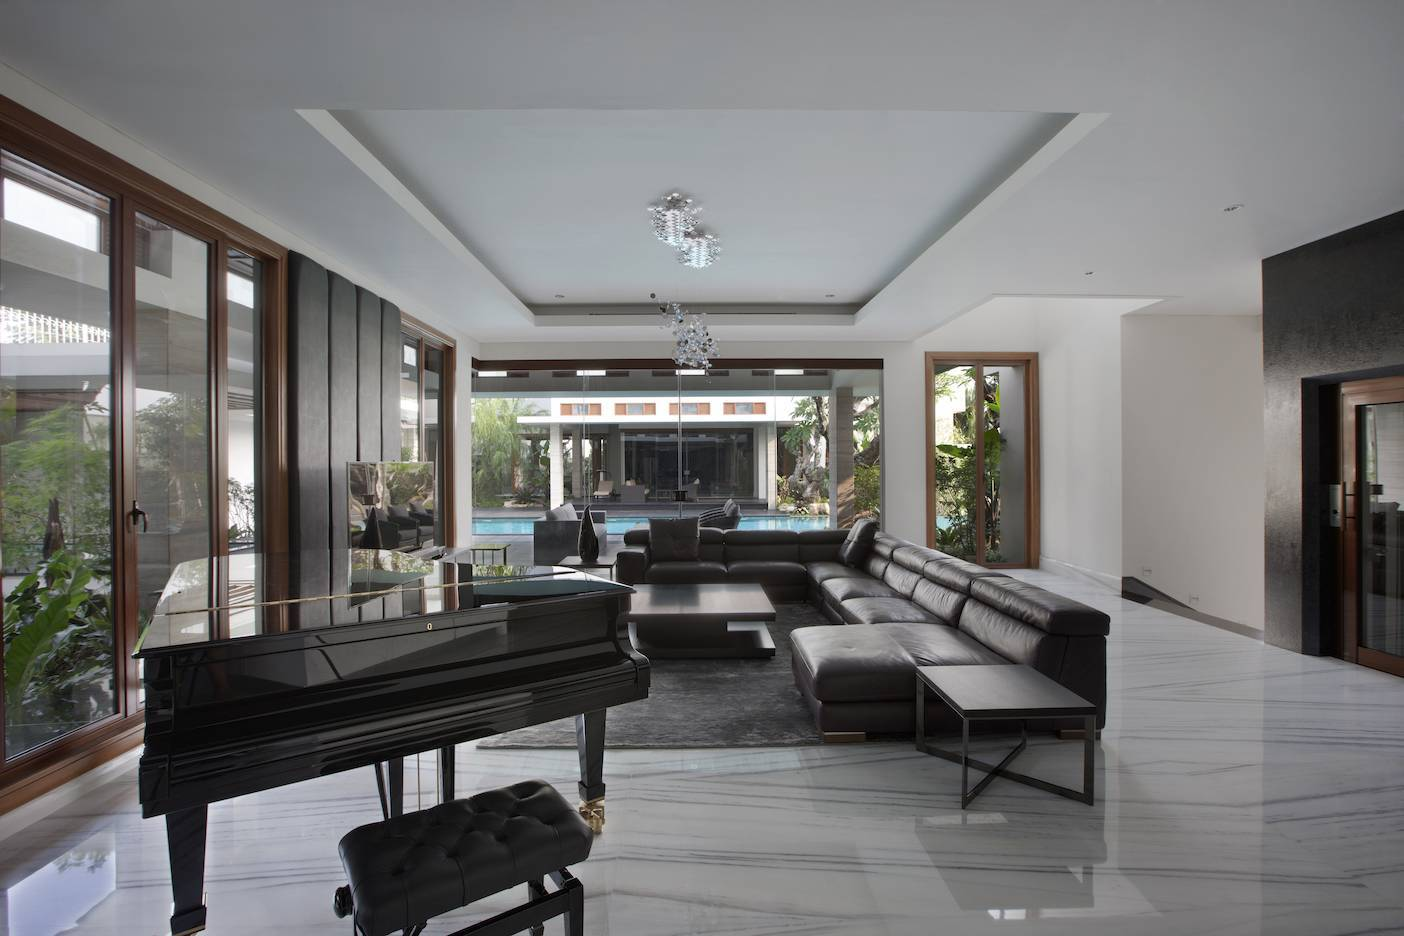 Parama Dharma Rumah Opal Indonesia Indonesia Living Room   366